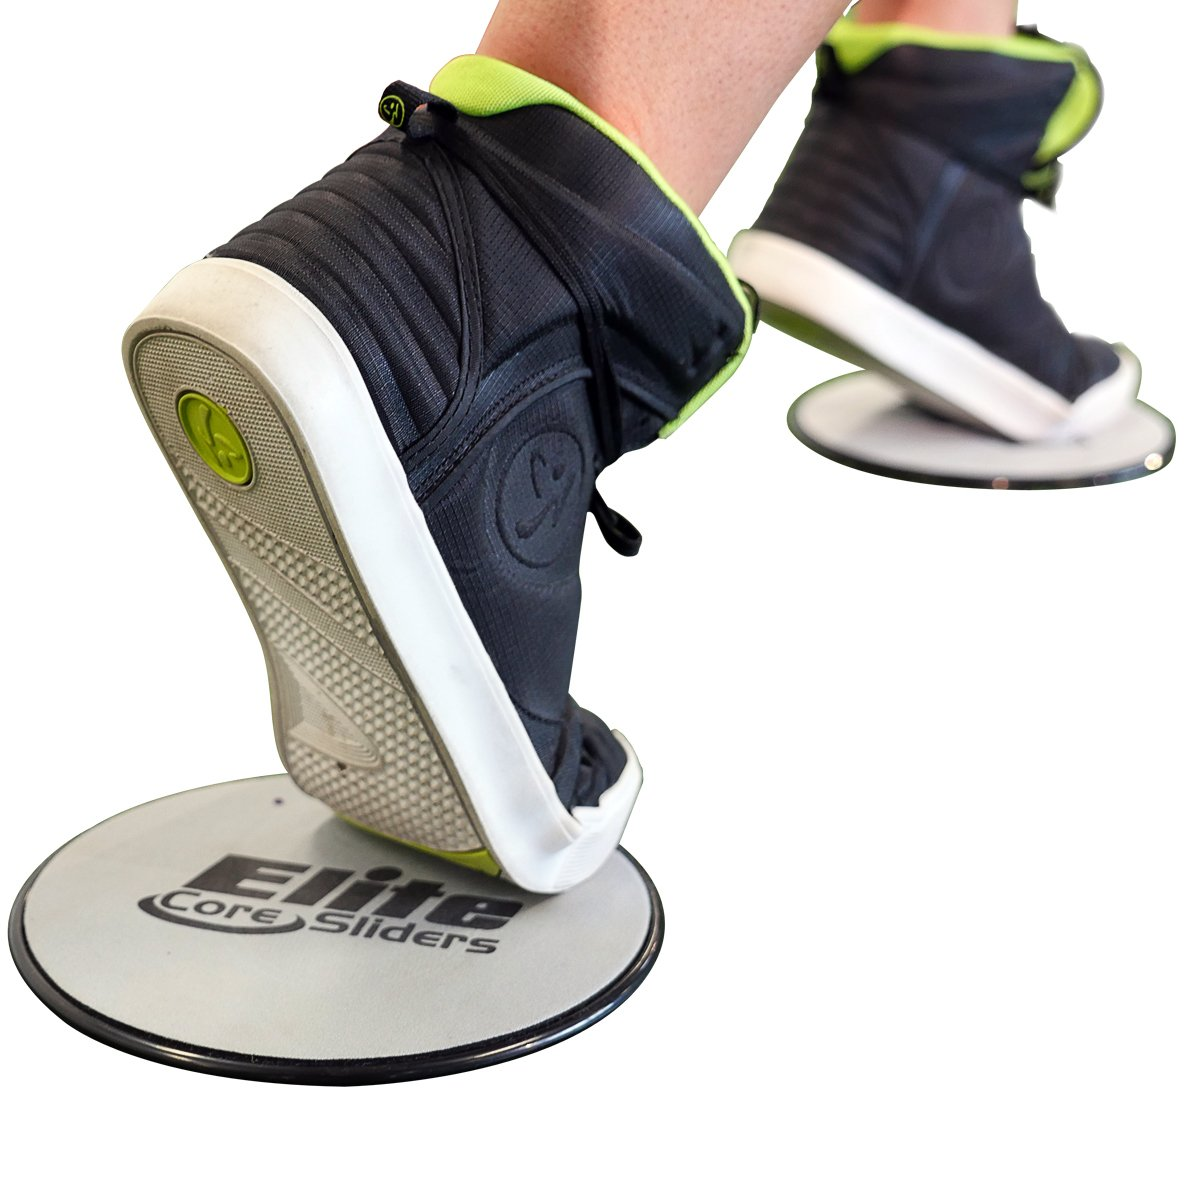 Carpet Sliders For Dance Shoes